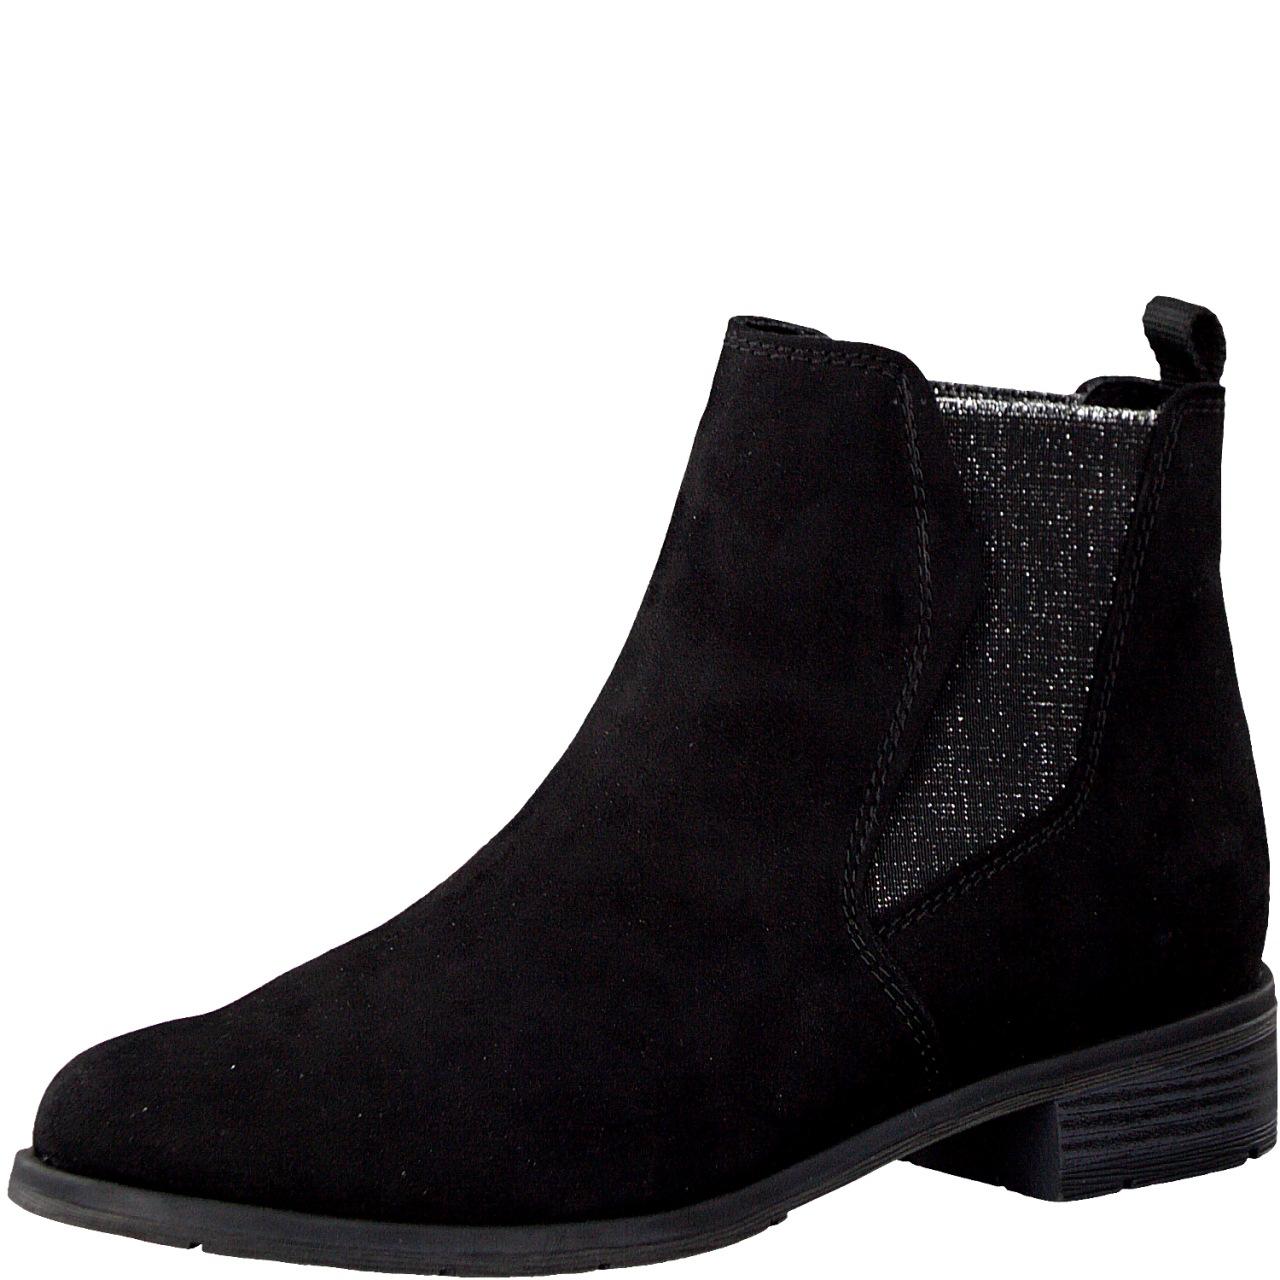 Details about Marco Tozzi Ladies Ankle Boots Chelsea Boots 2 25321 33 Black